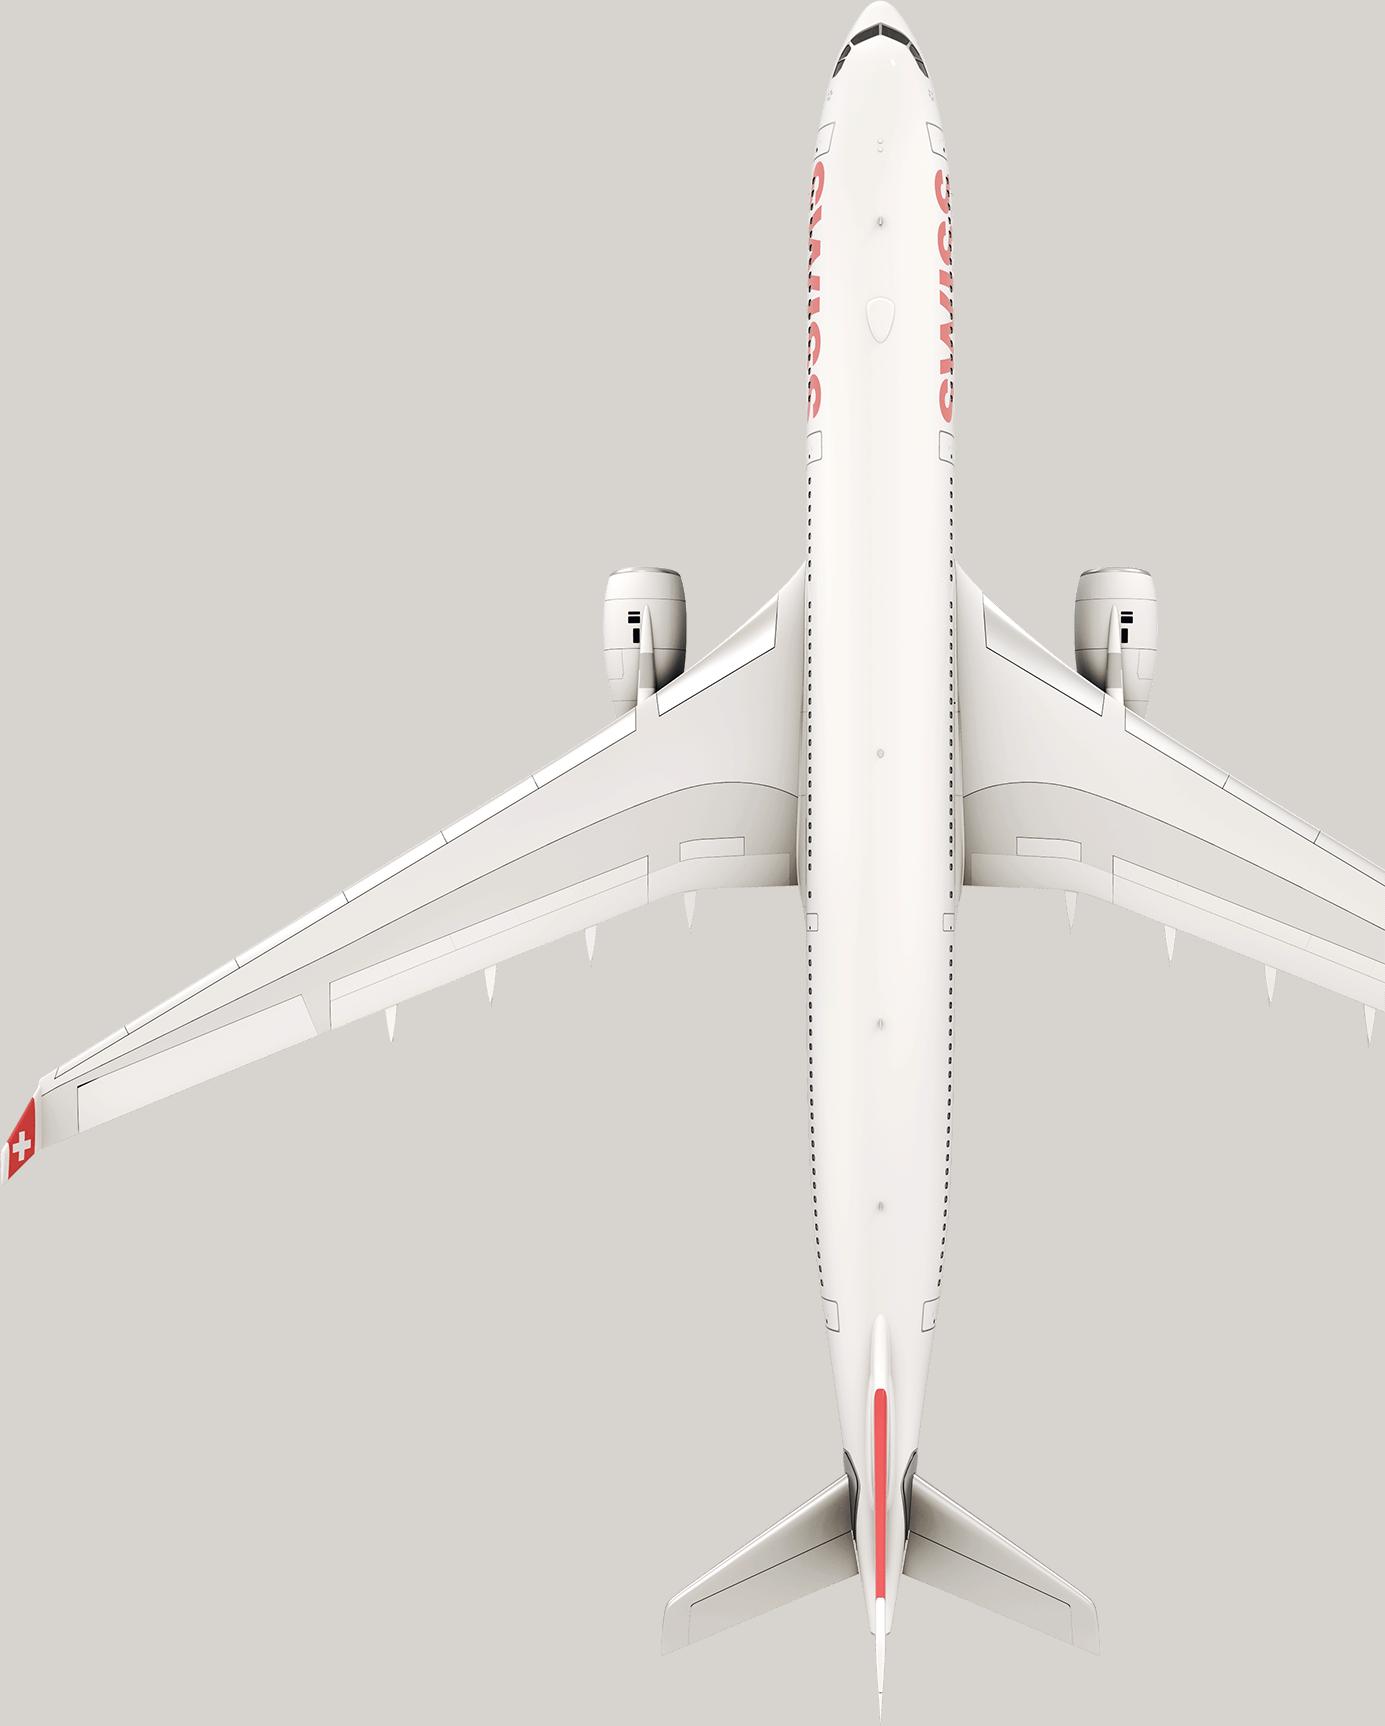 SWISSの世界 - エアバス A330-300 ...